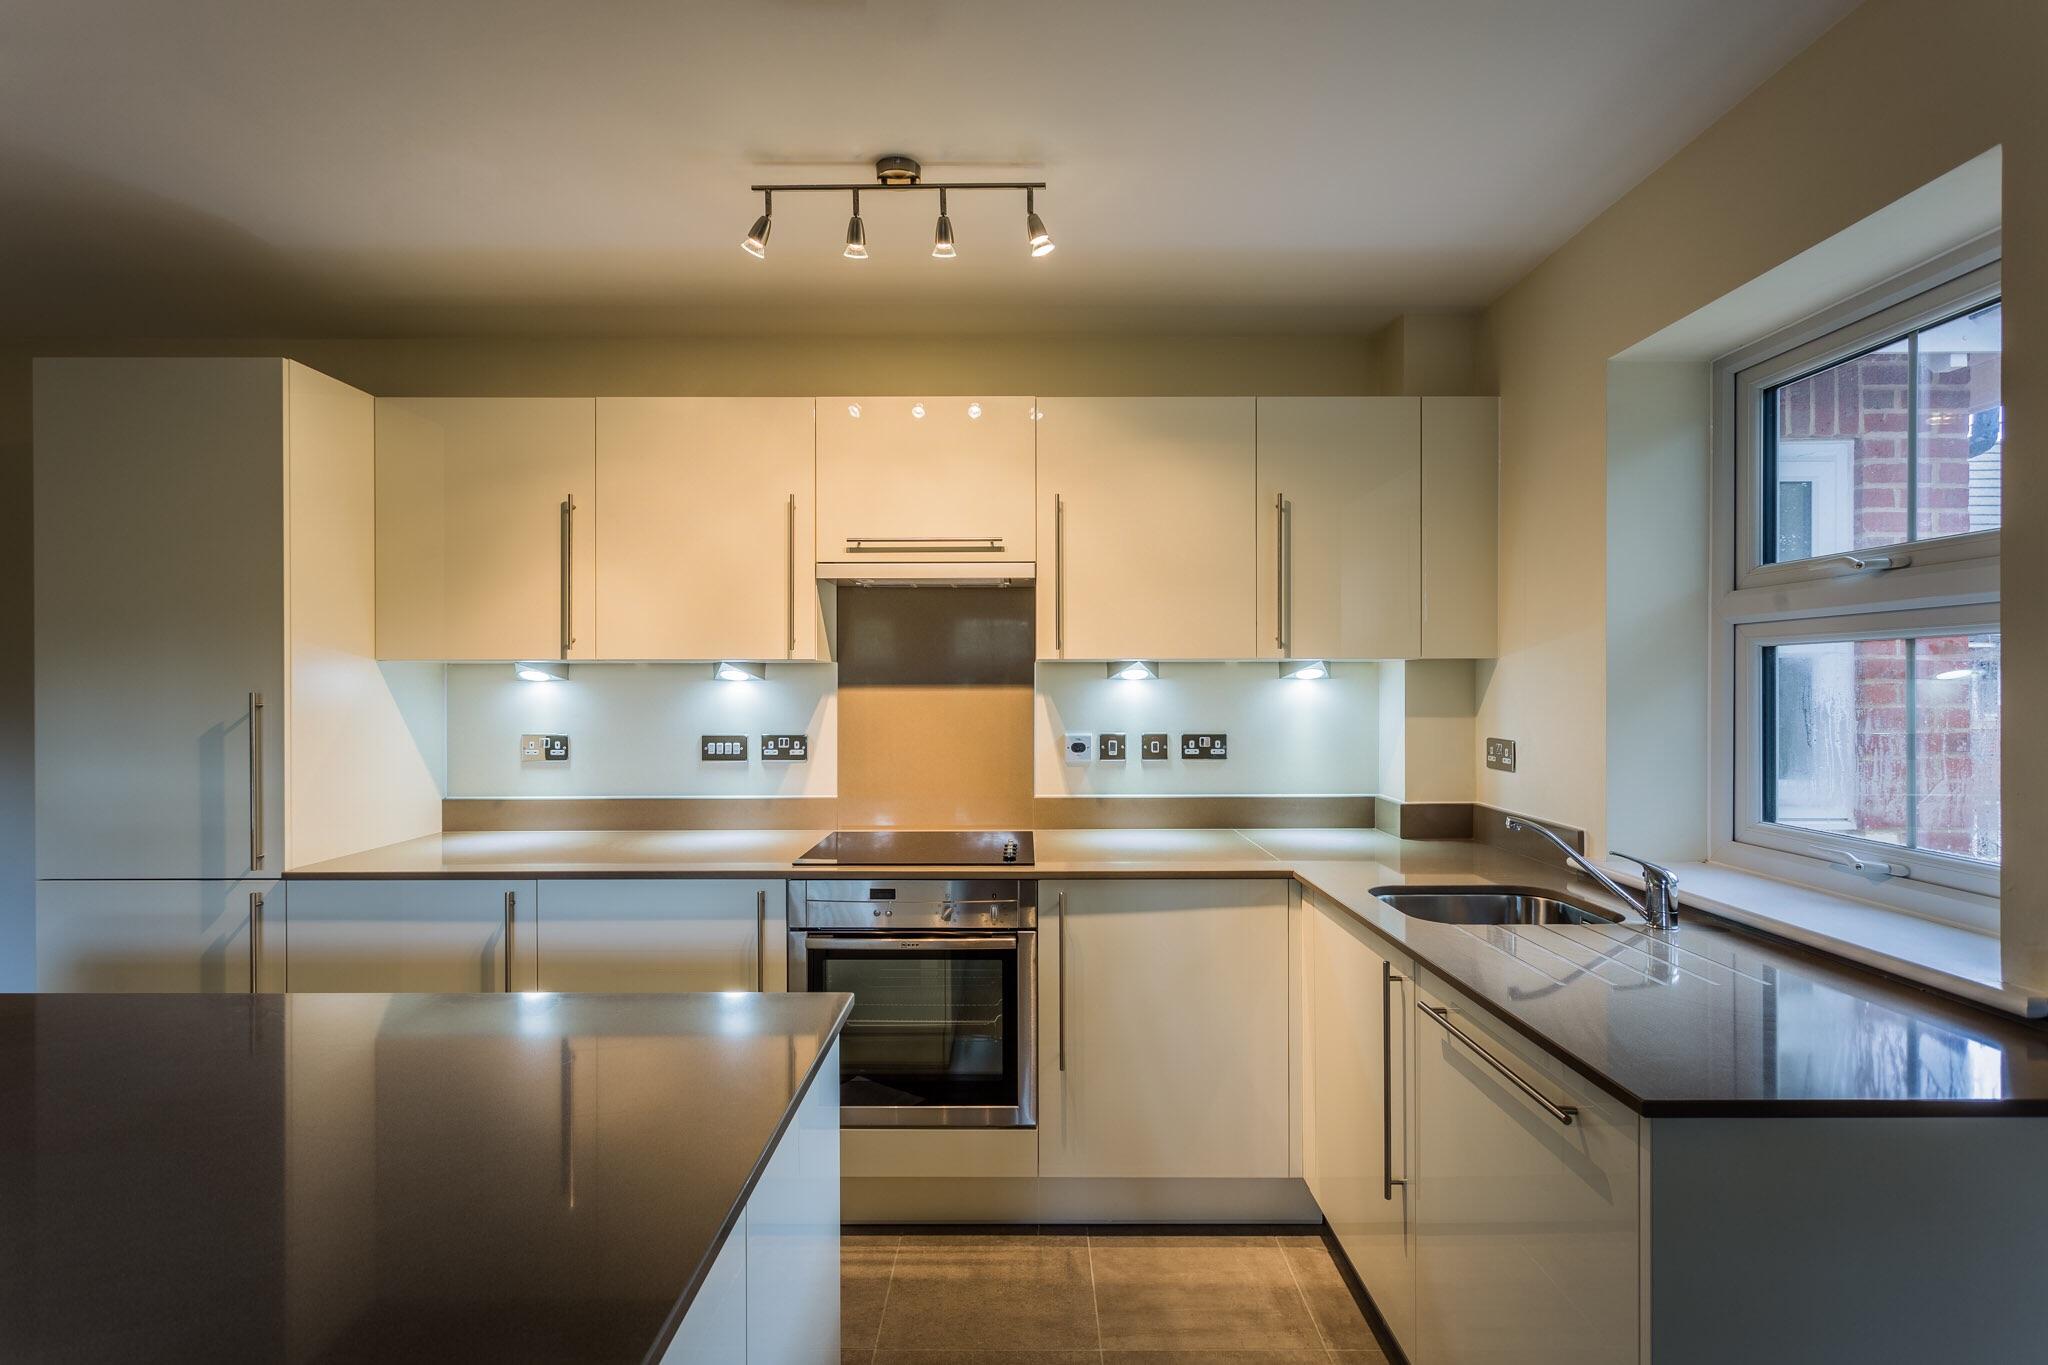 Kitchen - interior design photography by Rick McEvoy